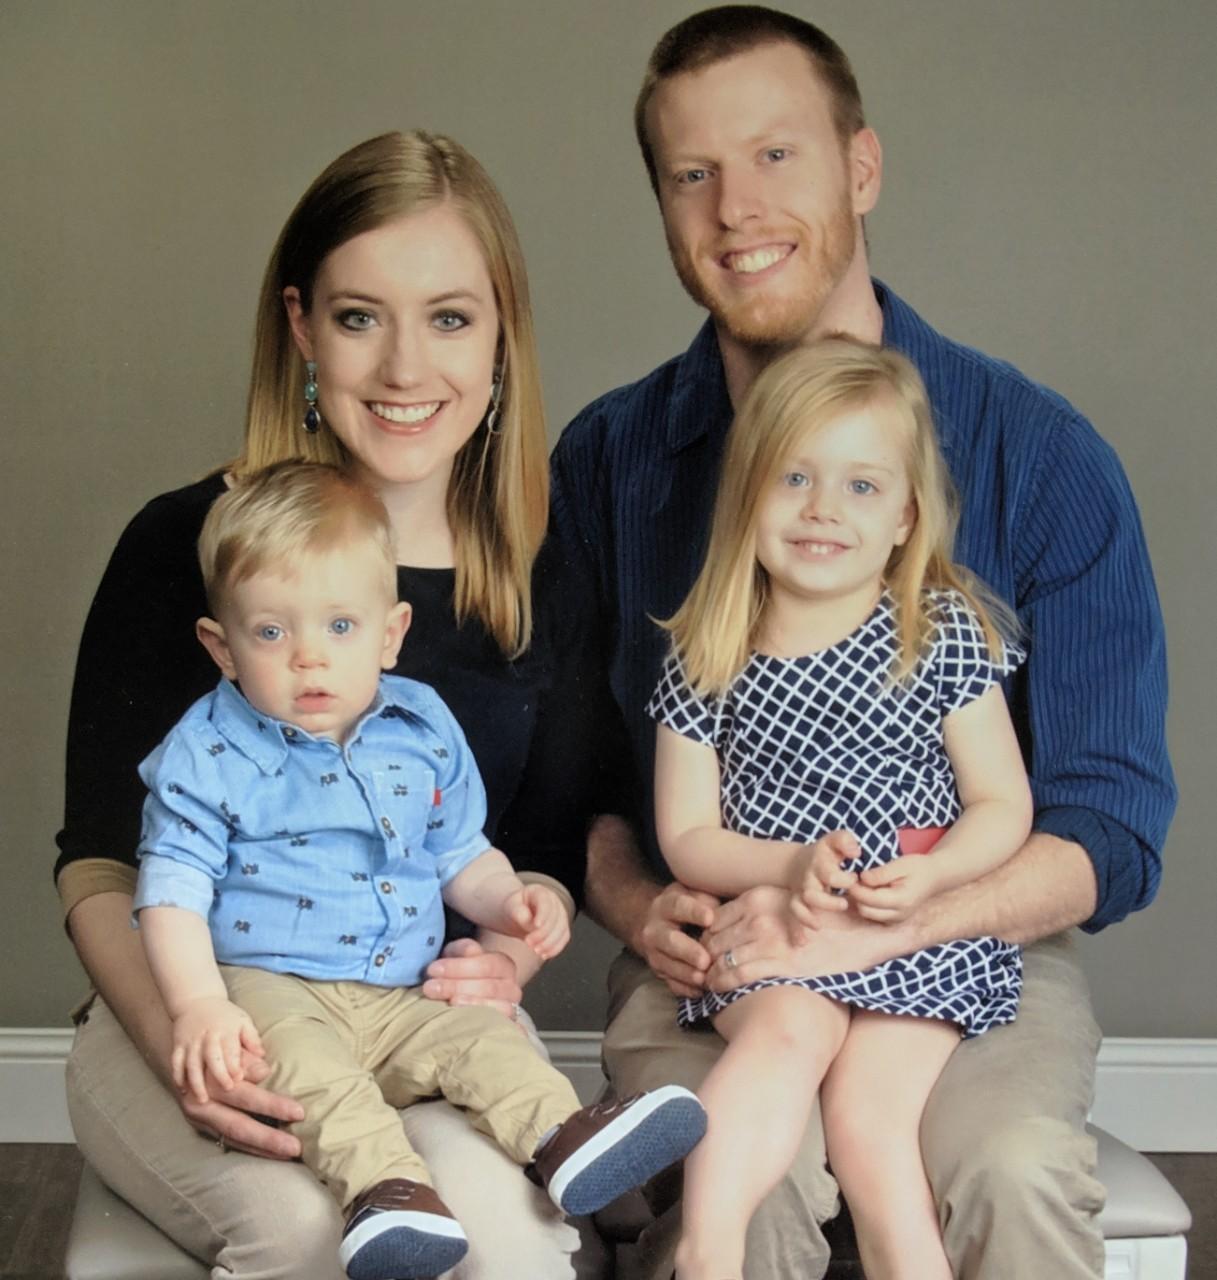 McClellan family portrait.